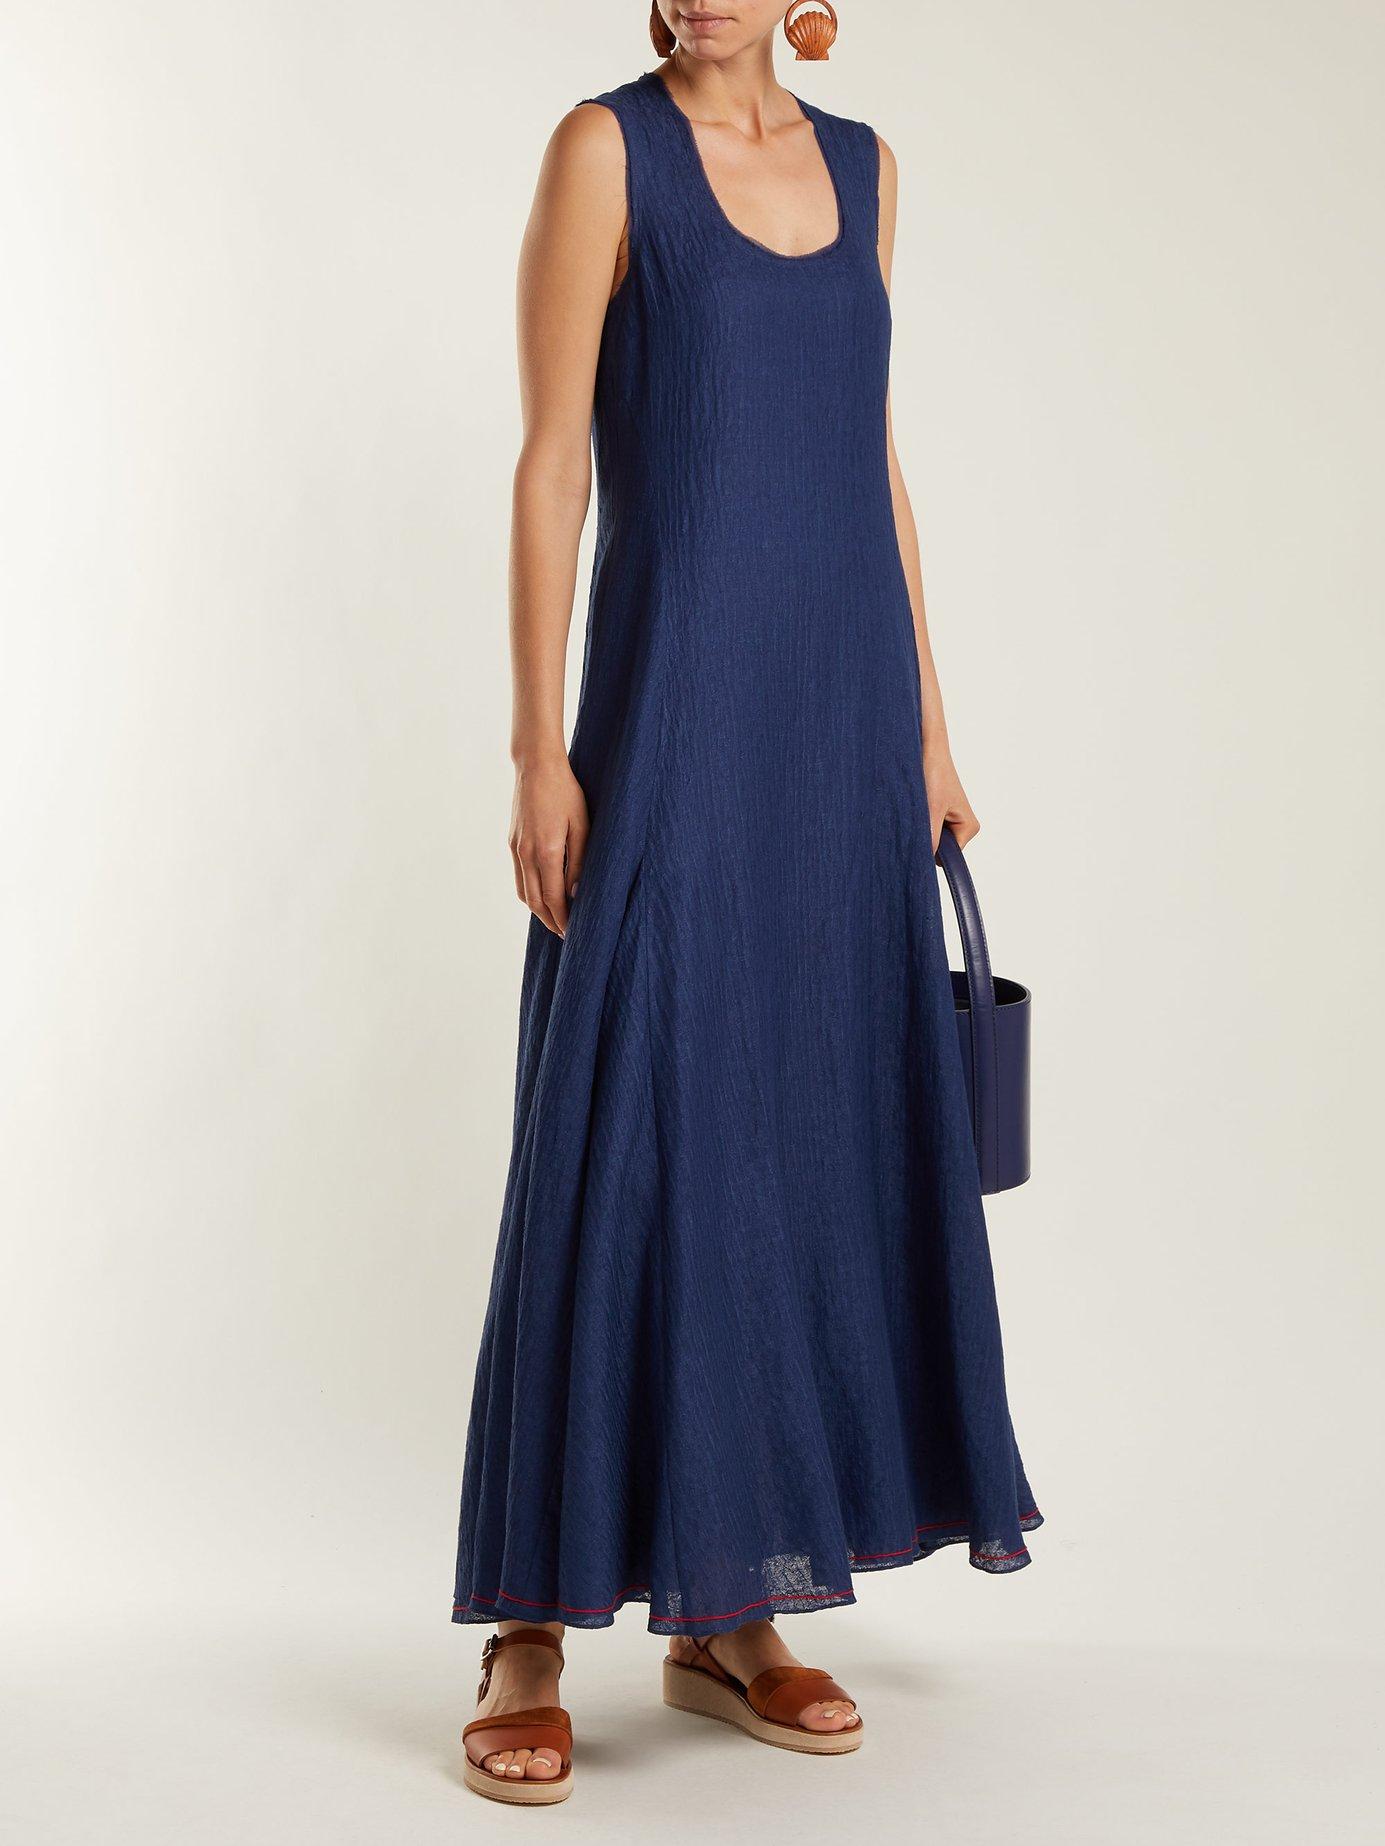 Lenox sleeveless linen-blend dress by Elizabeth And James